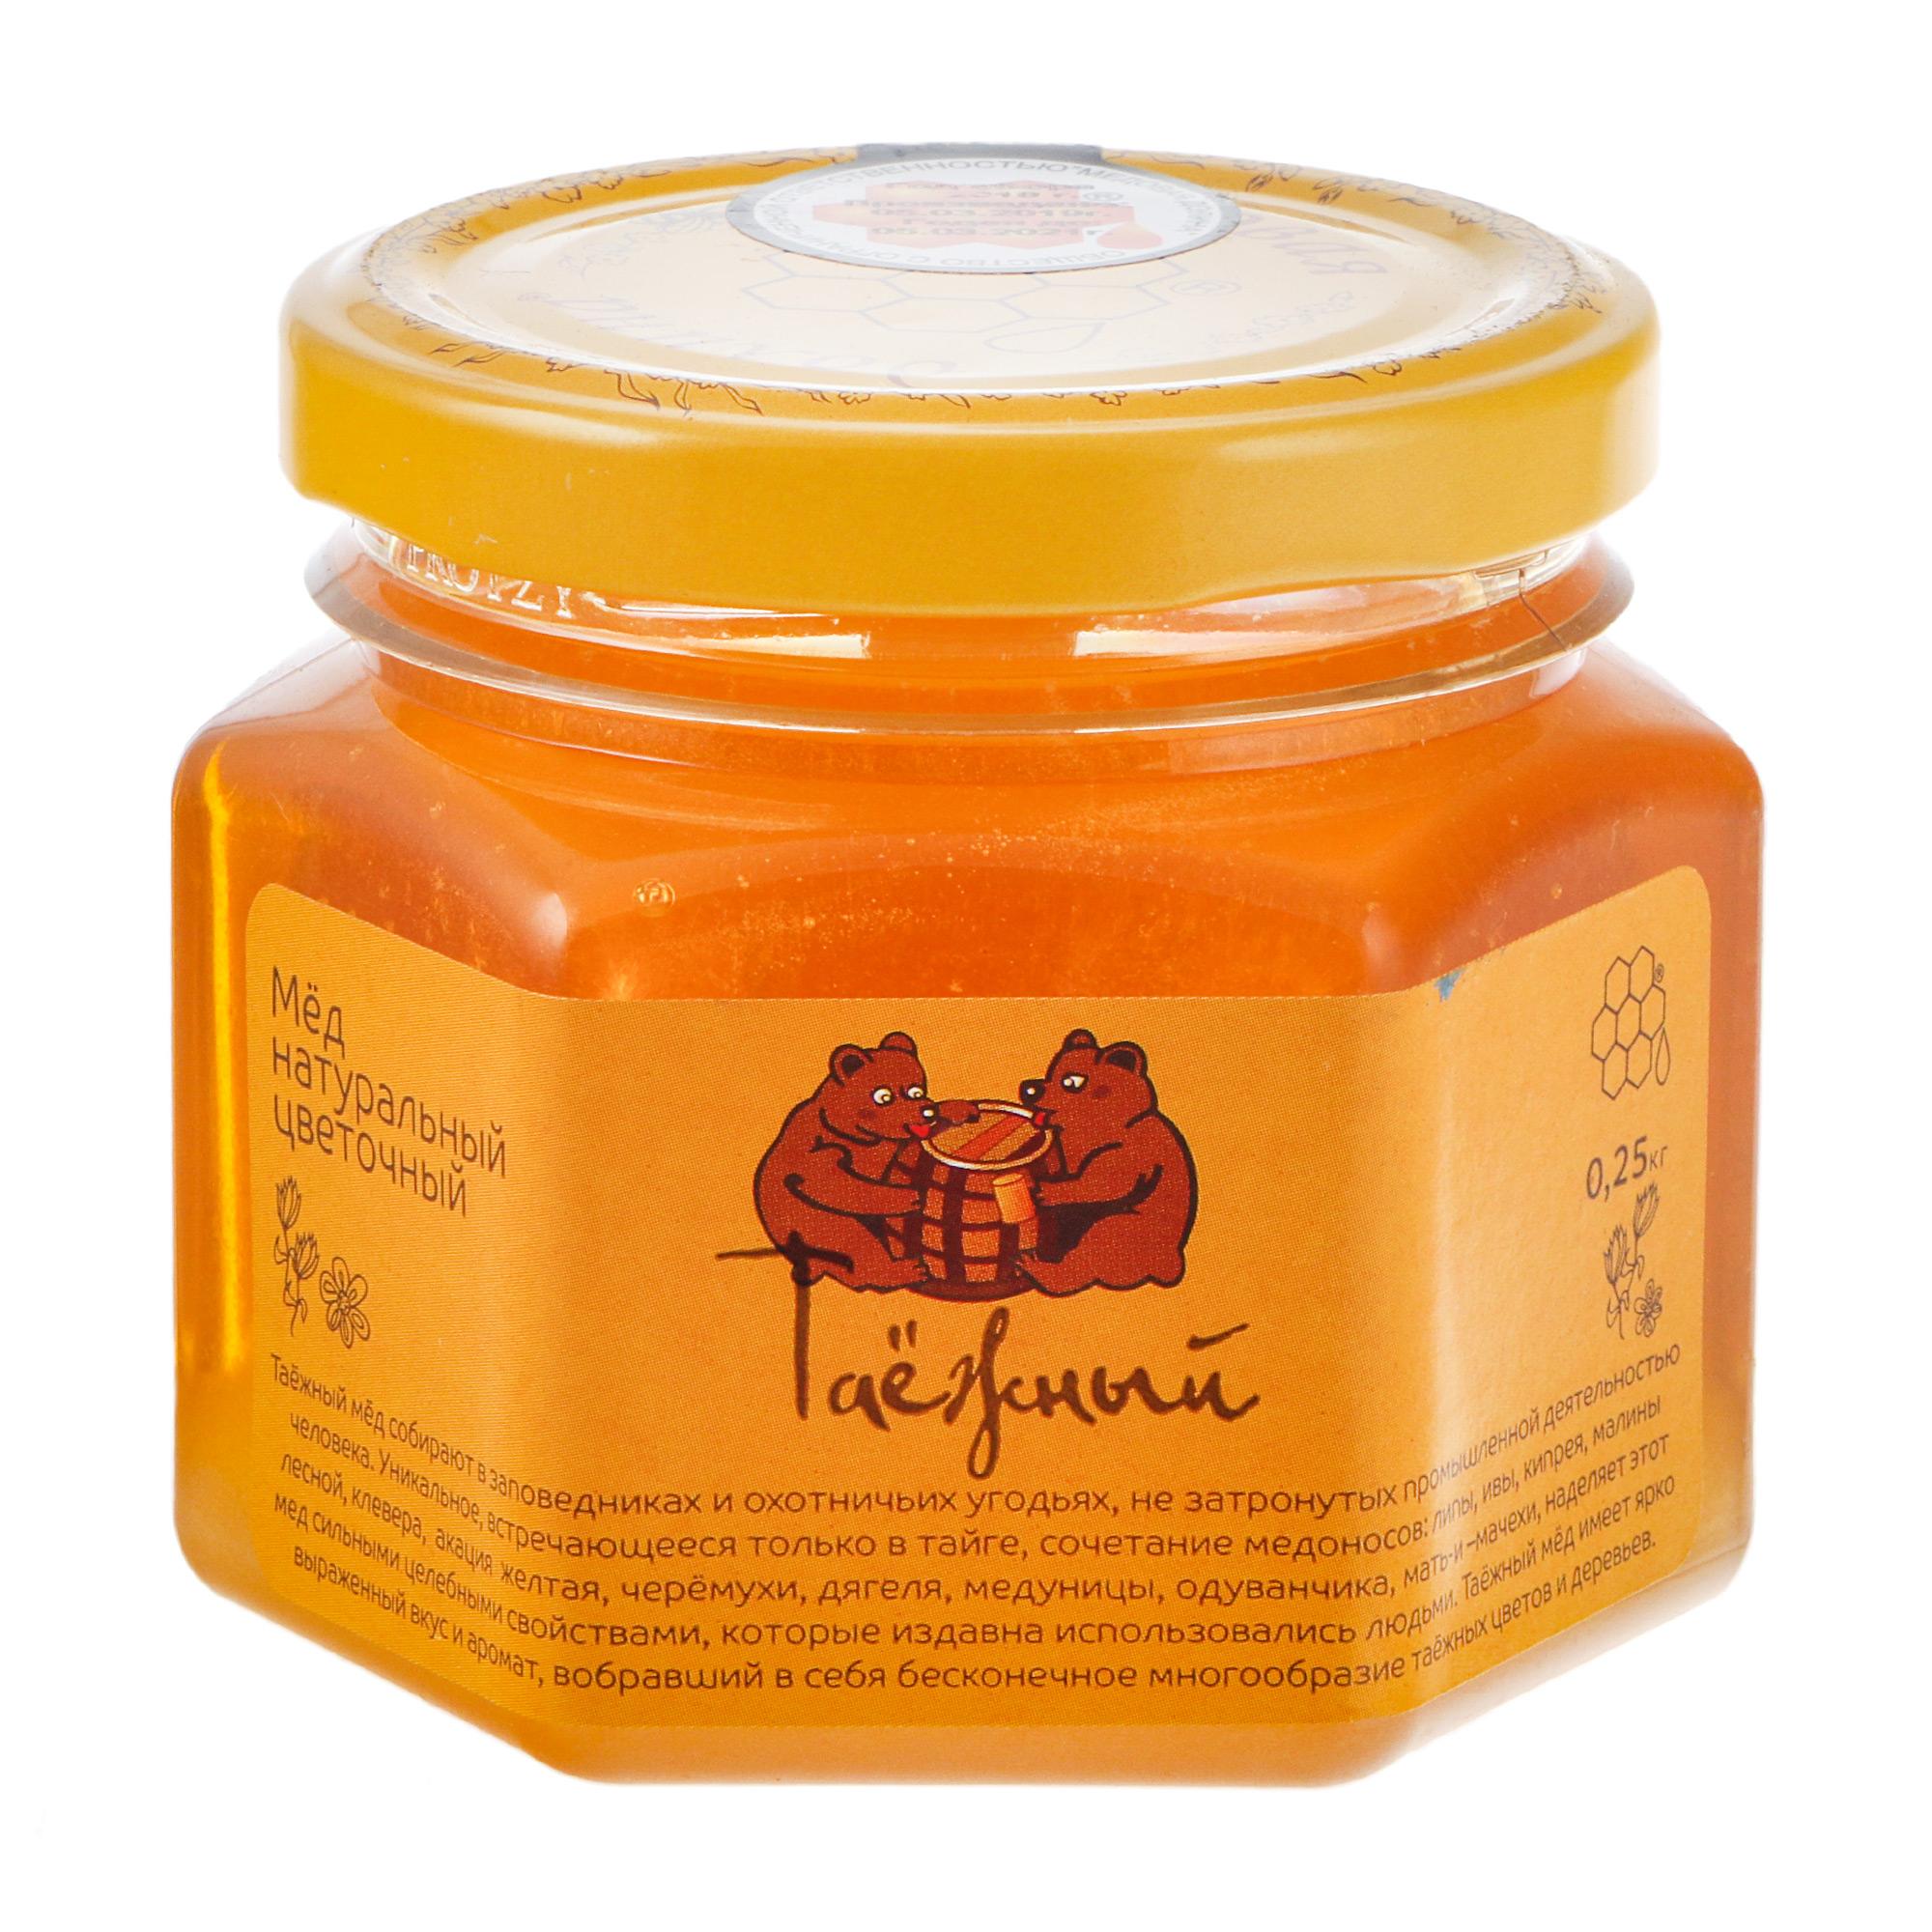 Мед Пчелиная аптека Таежный натуральный 250 г